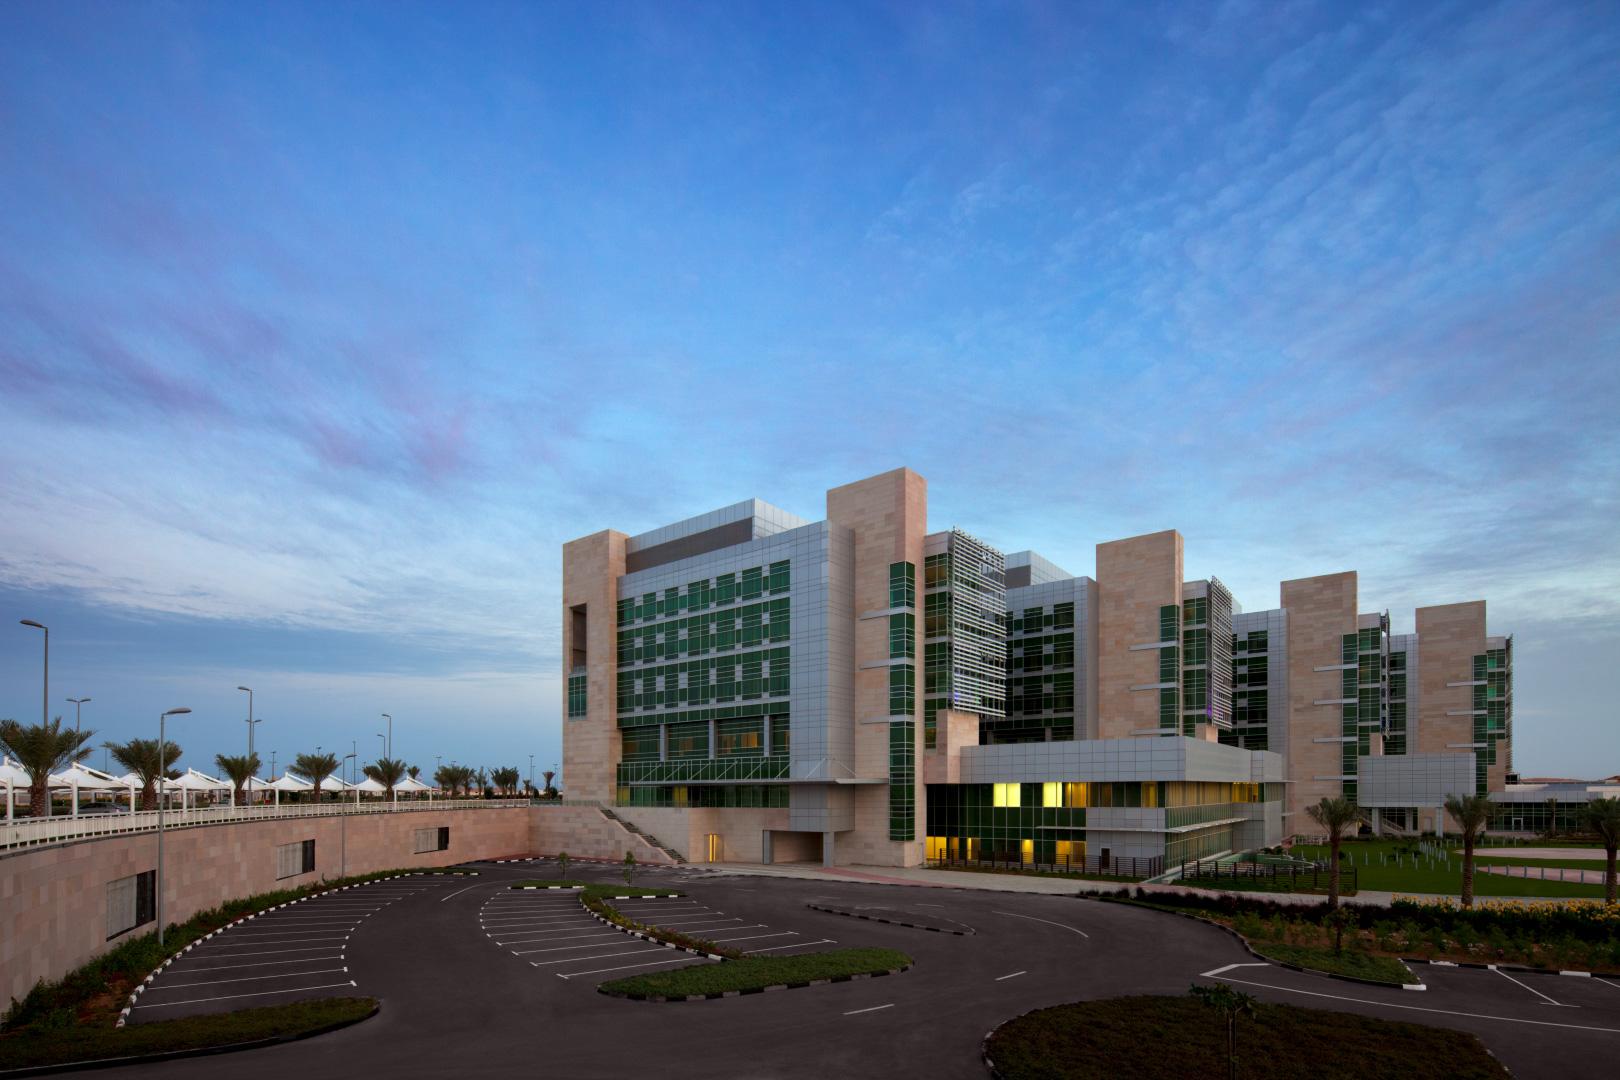 Sheikh Khalifa Specialist Hospital